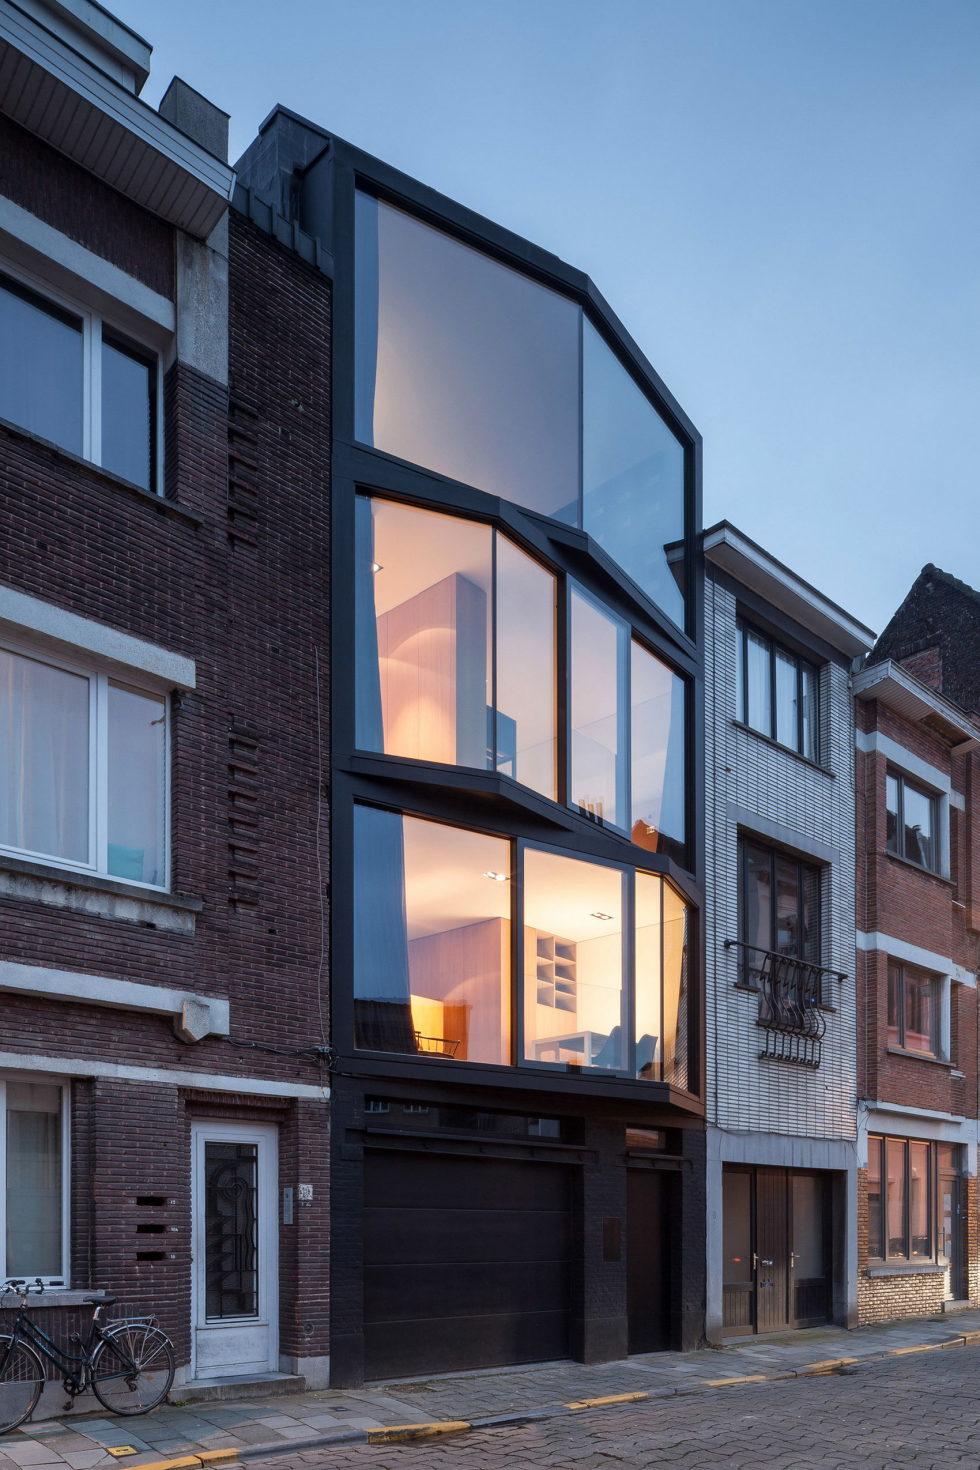 The House With Polyangular Glass Facade In Belgium 27